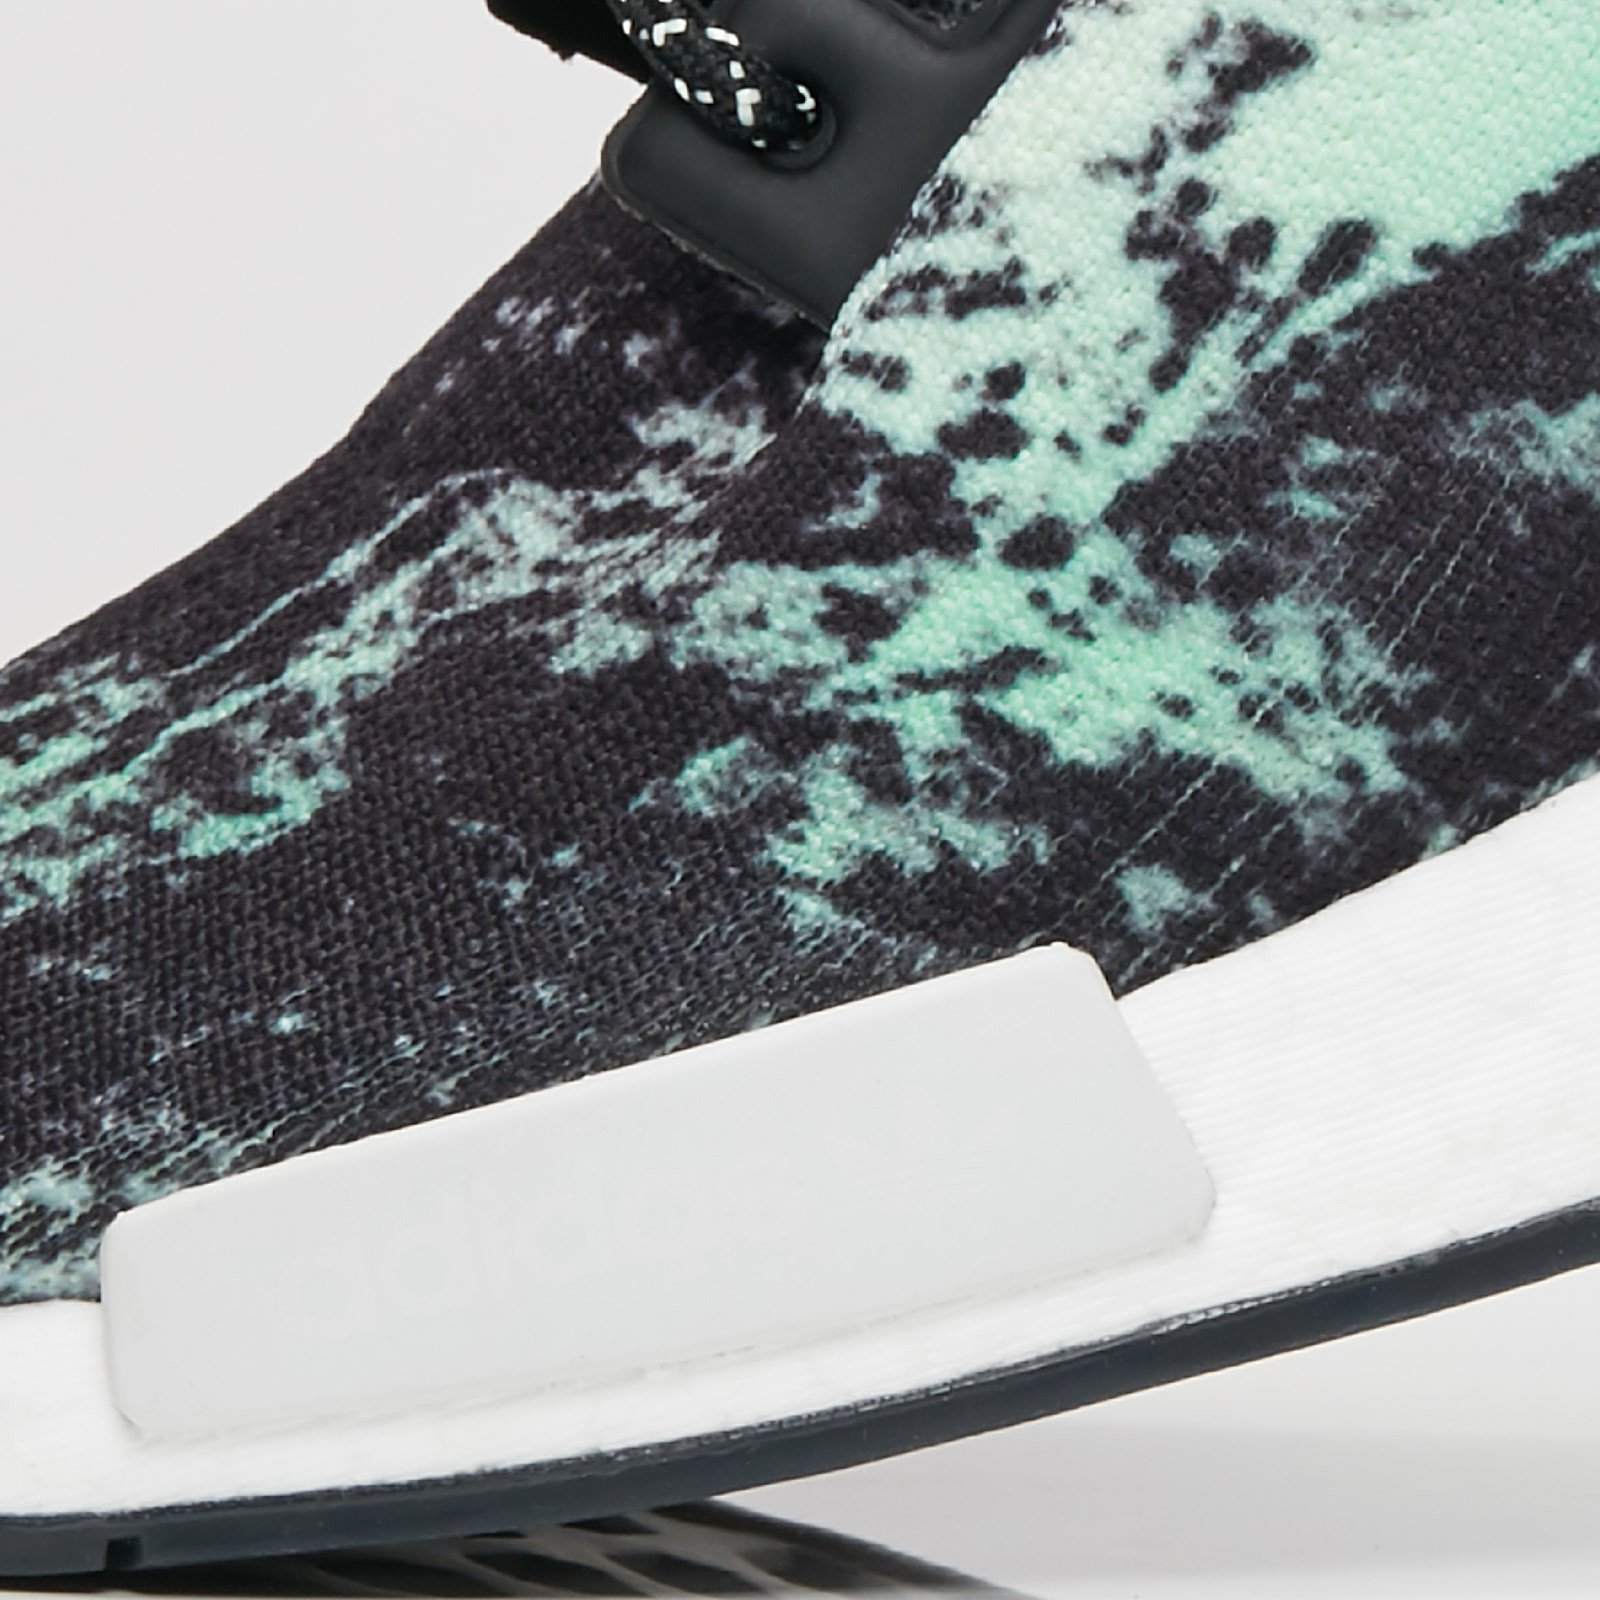 de4eb8d94b0a4 adidas NMD R1 PK - Bb7996 - Sneakersnstuff